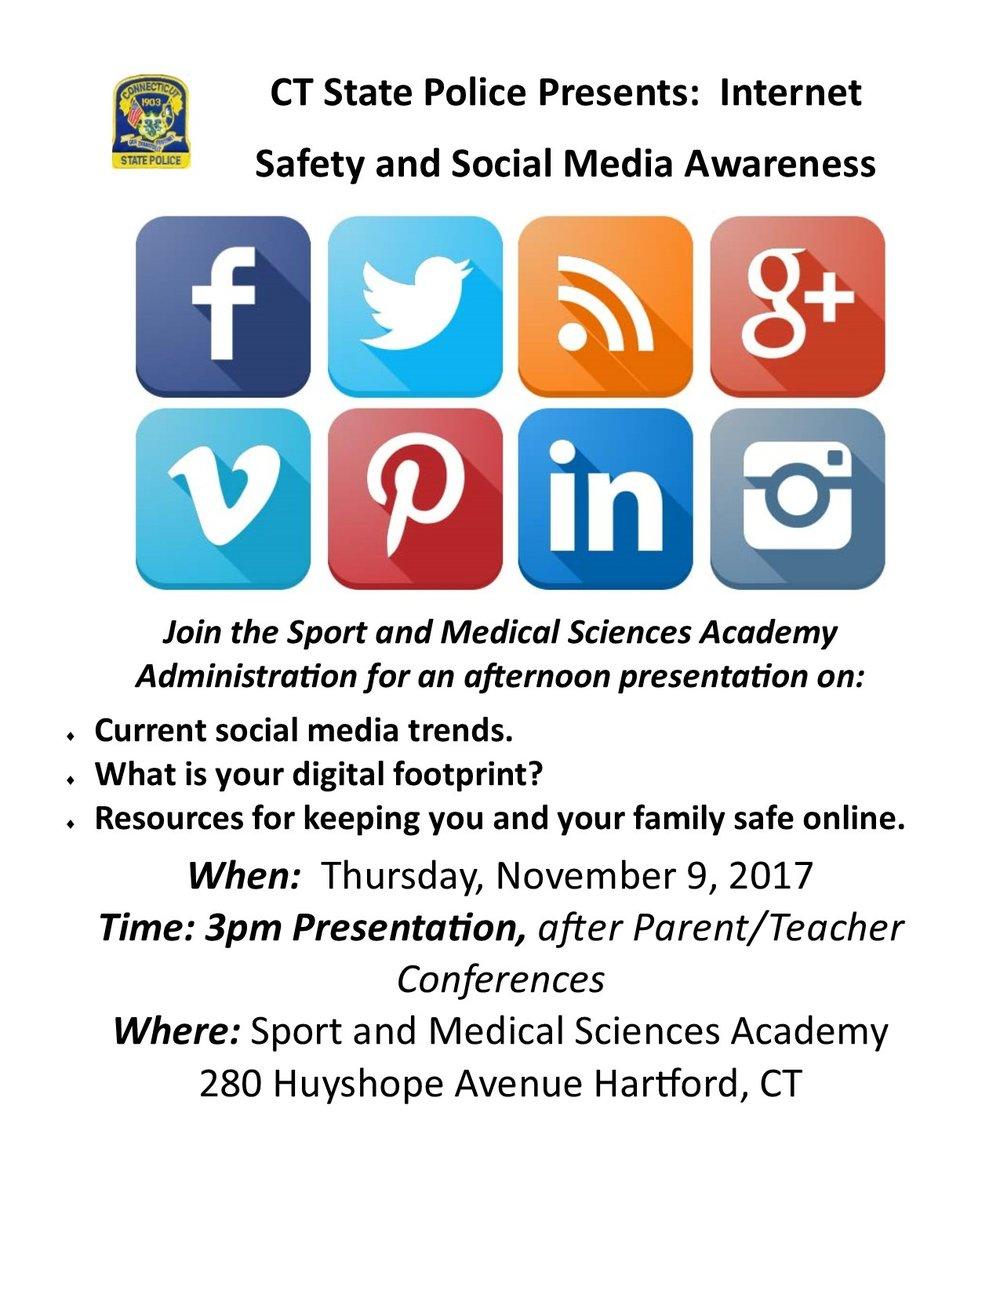 Internet Safety Poster Info Nov 2017.jpg